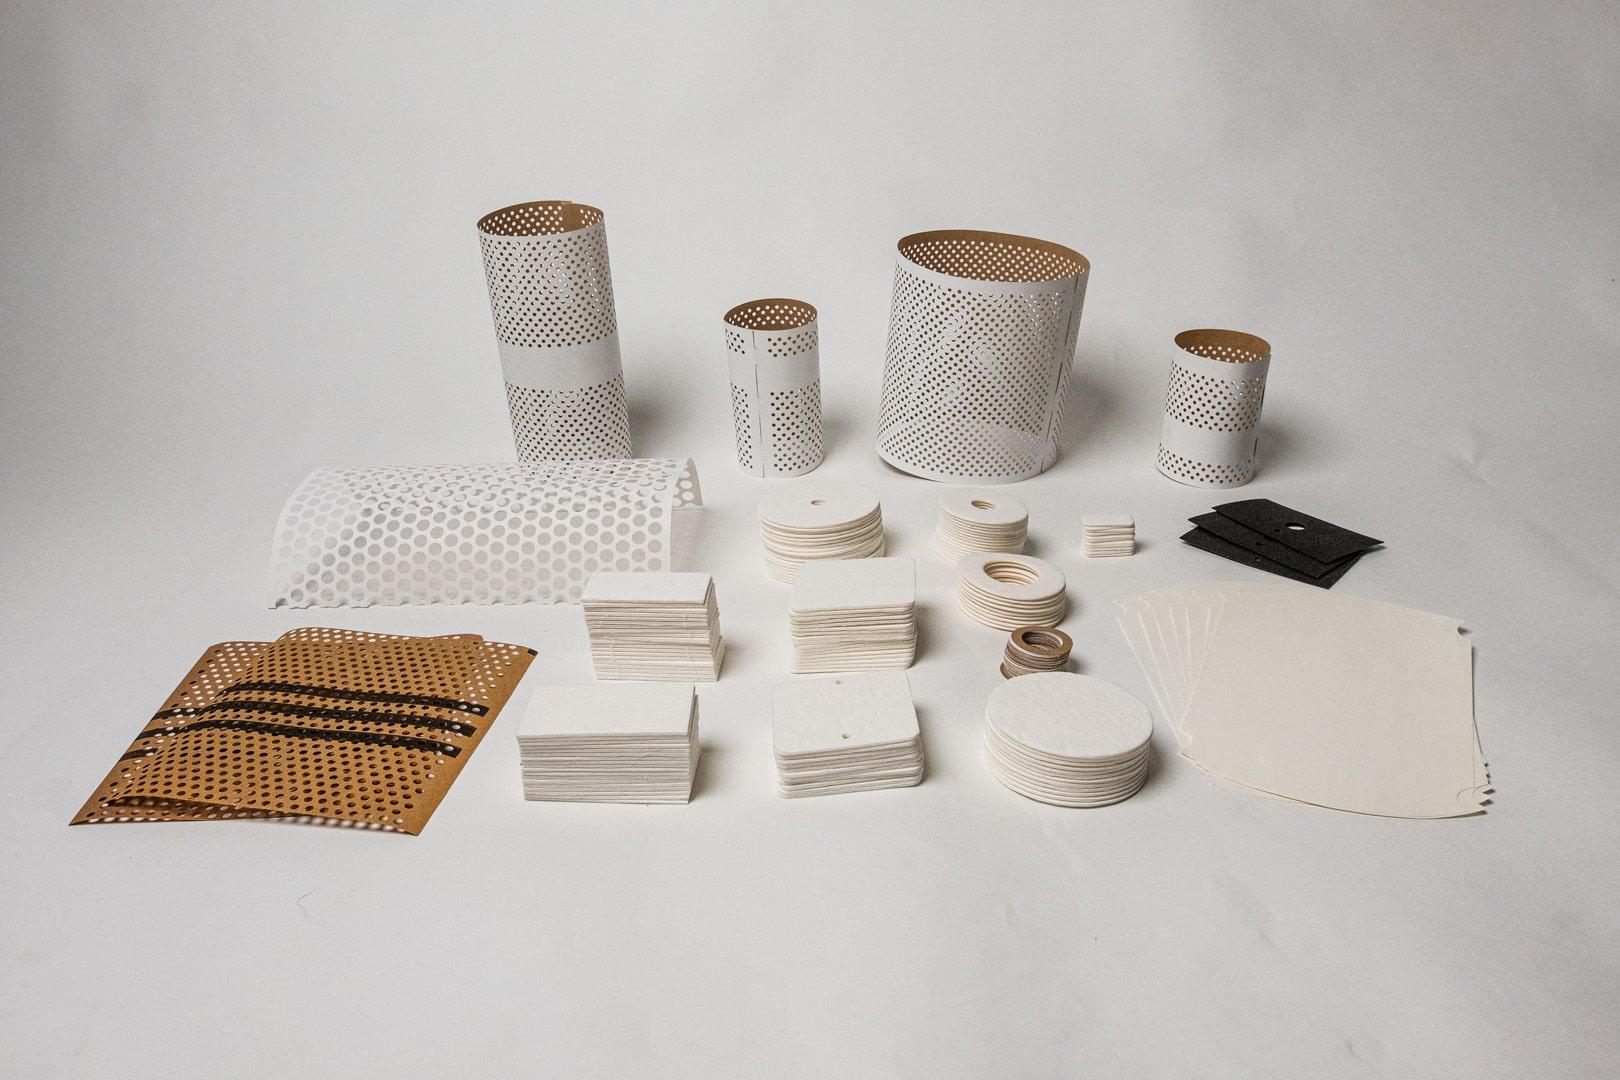 blotter paper converting - blotting paper